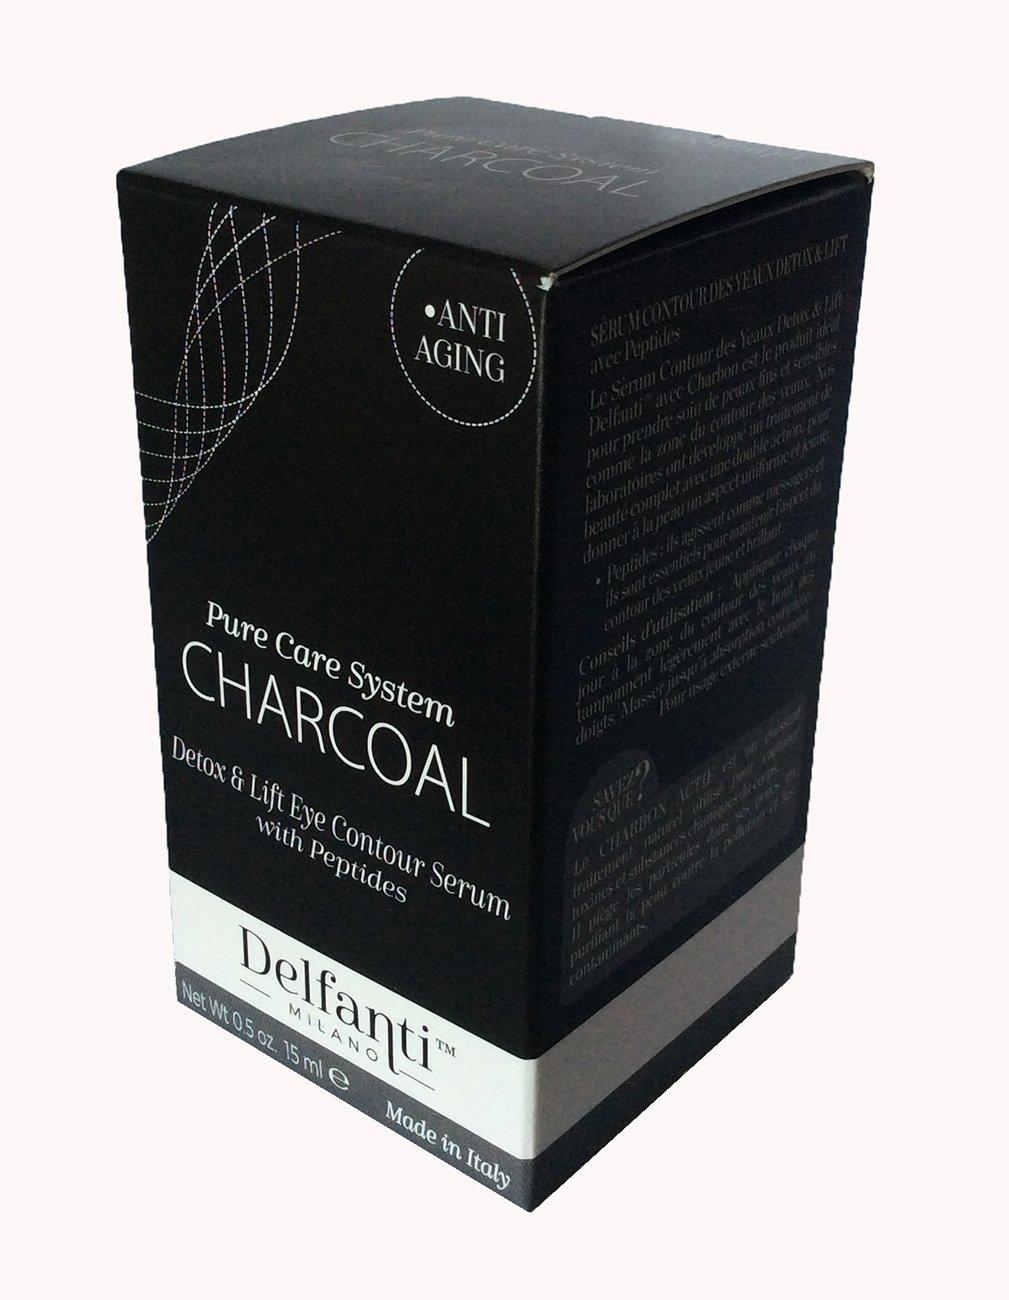 Delfanti Milano Charcoal Eye Contour Serum, 0.5 oz, Made in Italy